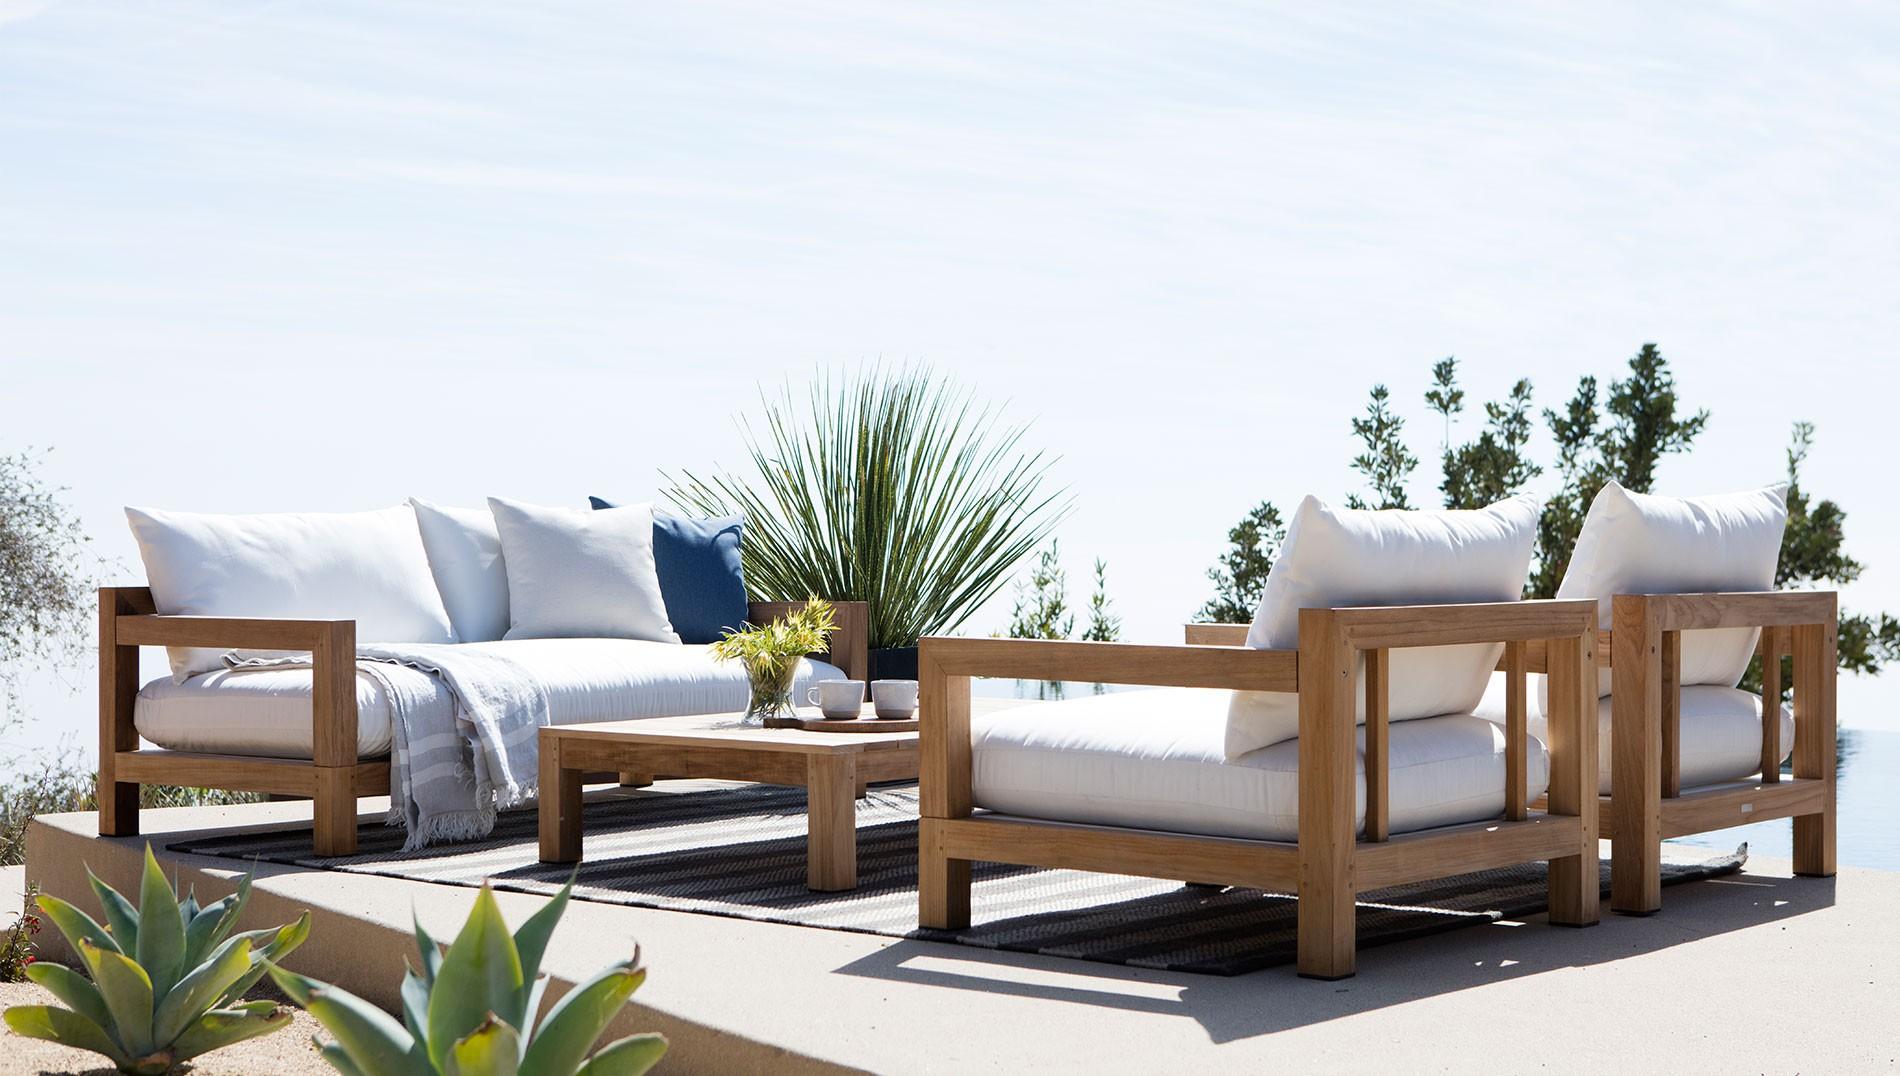 pi-sofa-armchaor.jpg